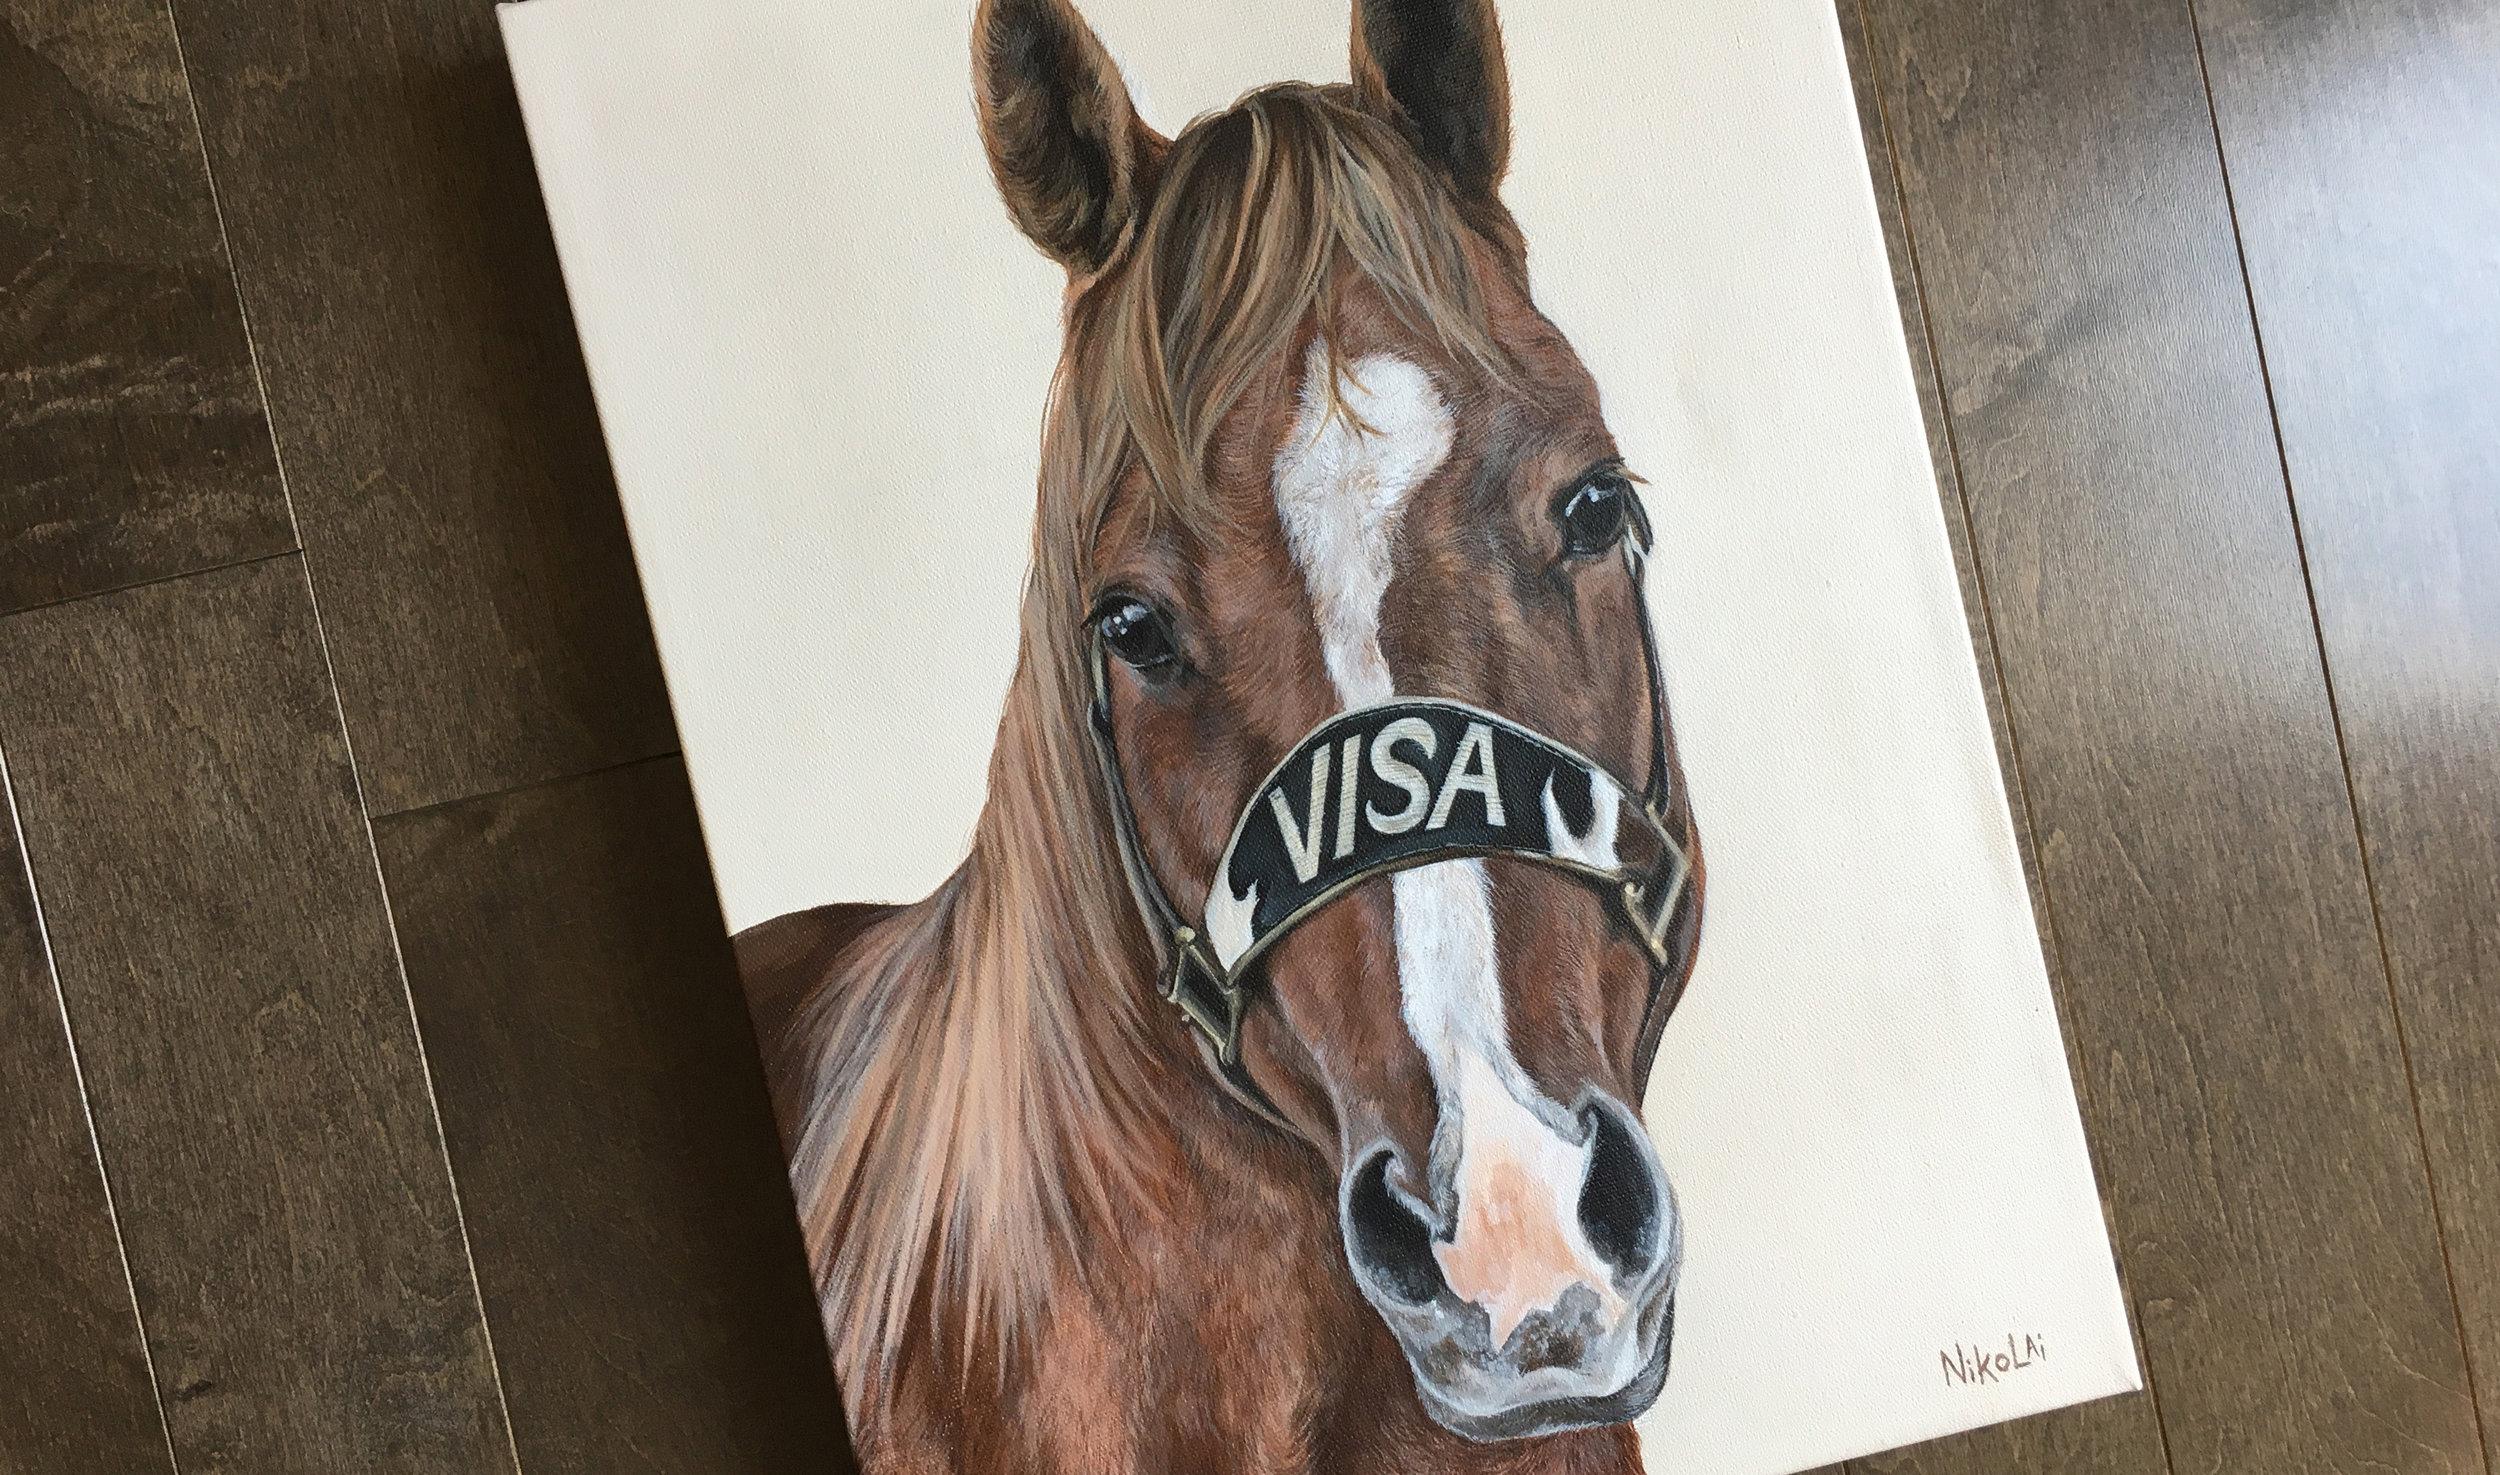 Visa (Quarter Horse) Portrait